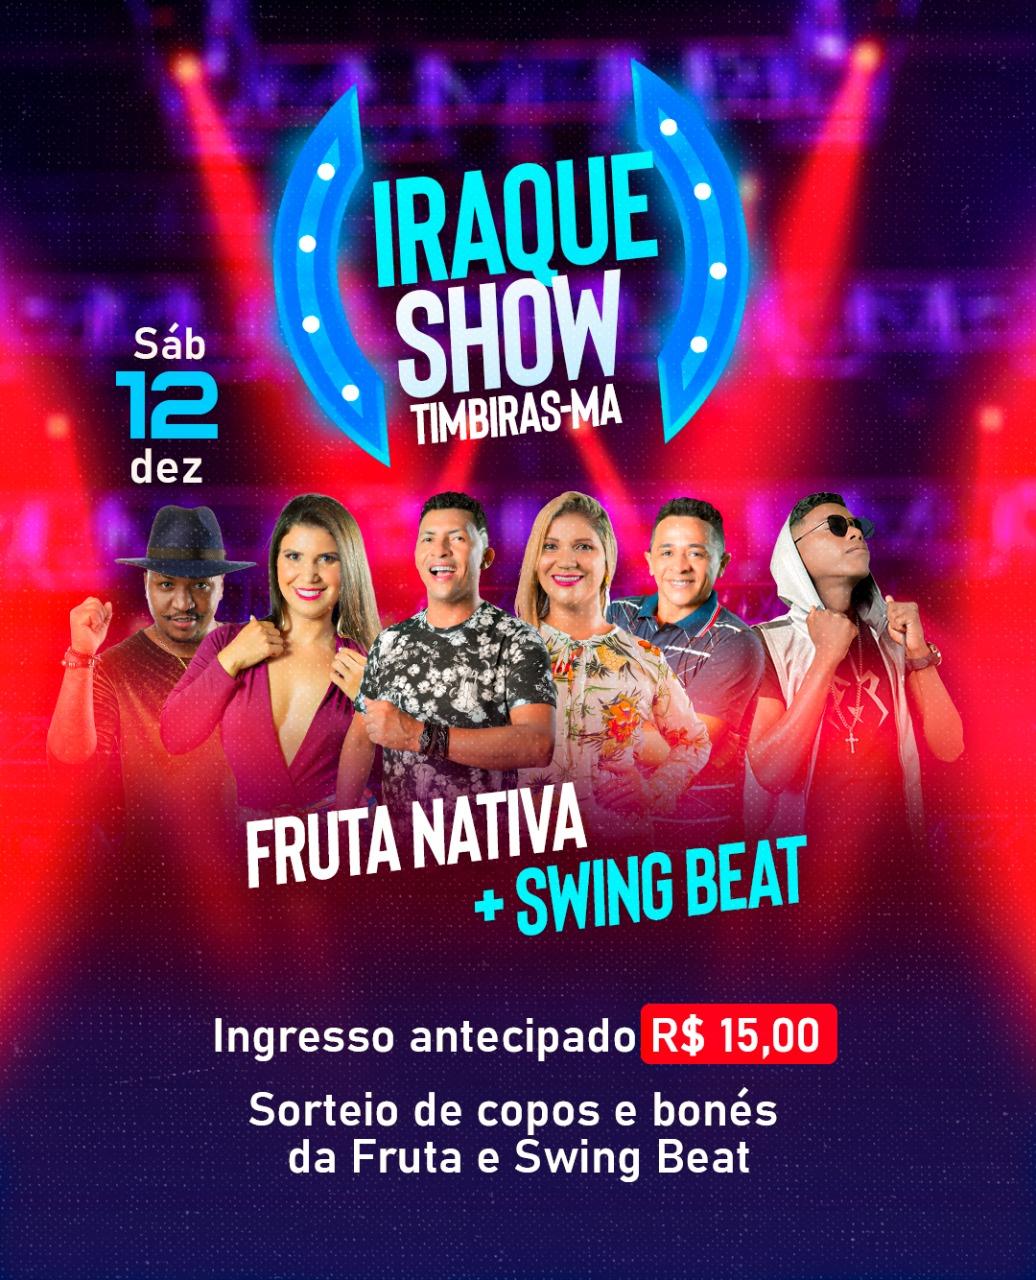 FRUTA NATIVA E SWING BEAT DIA 12 /12